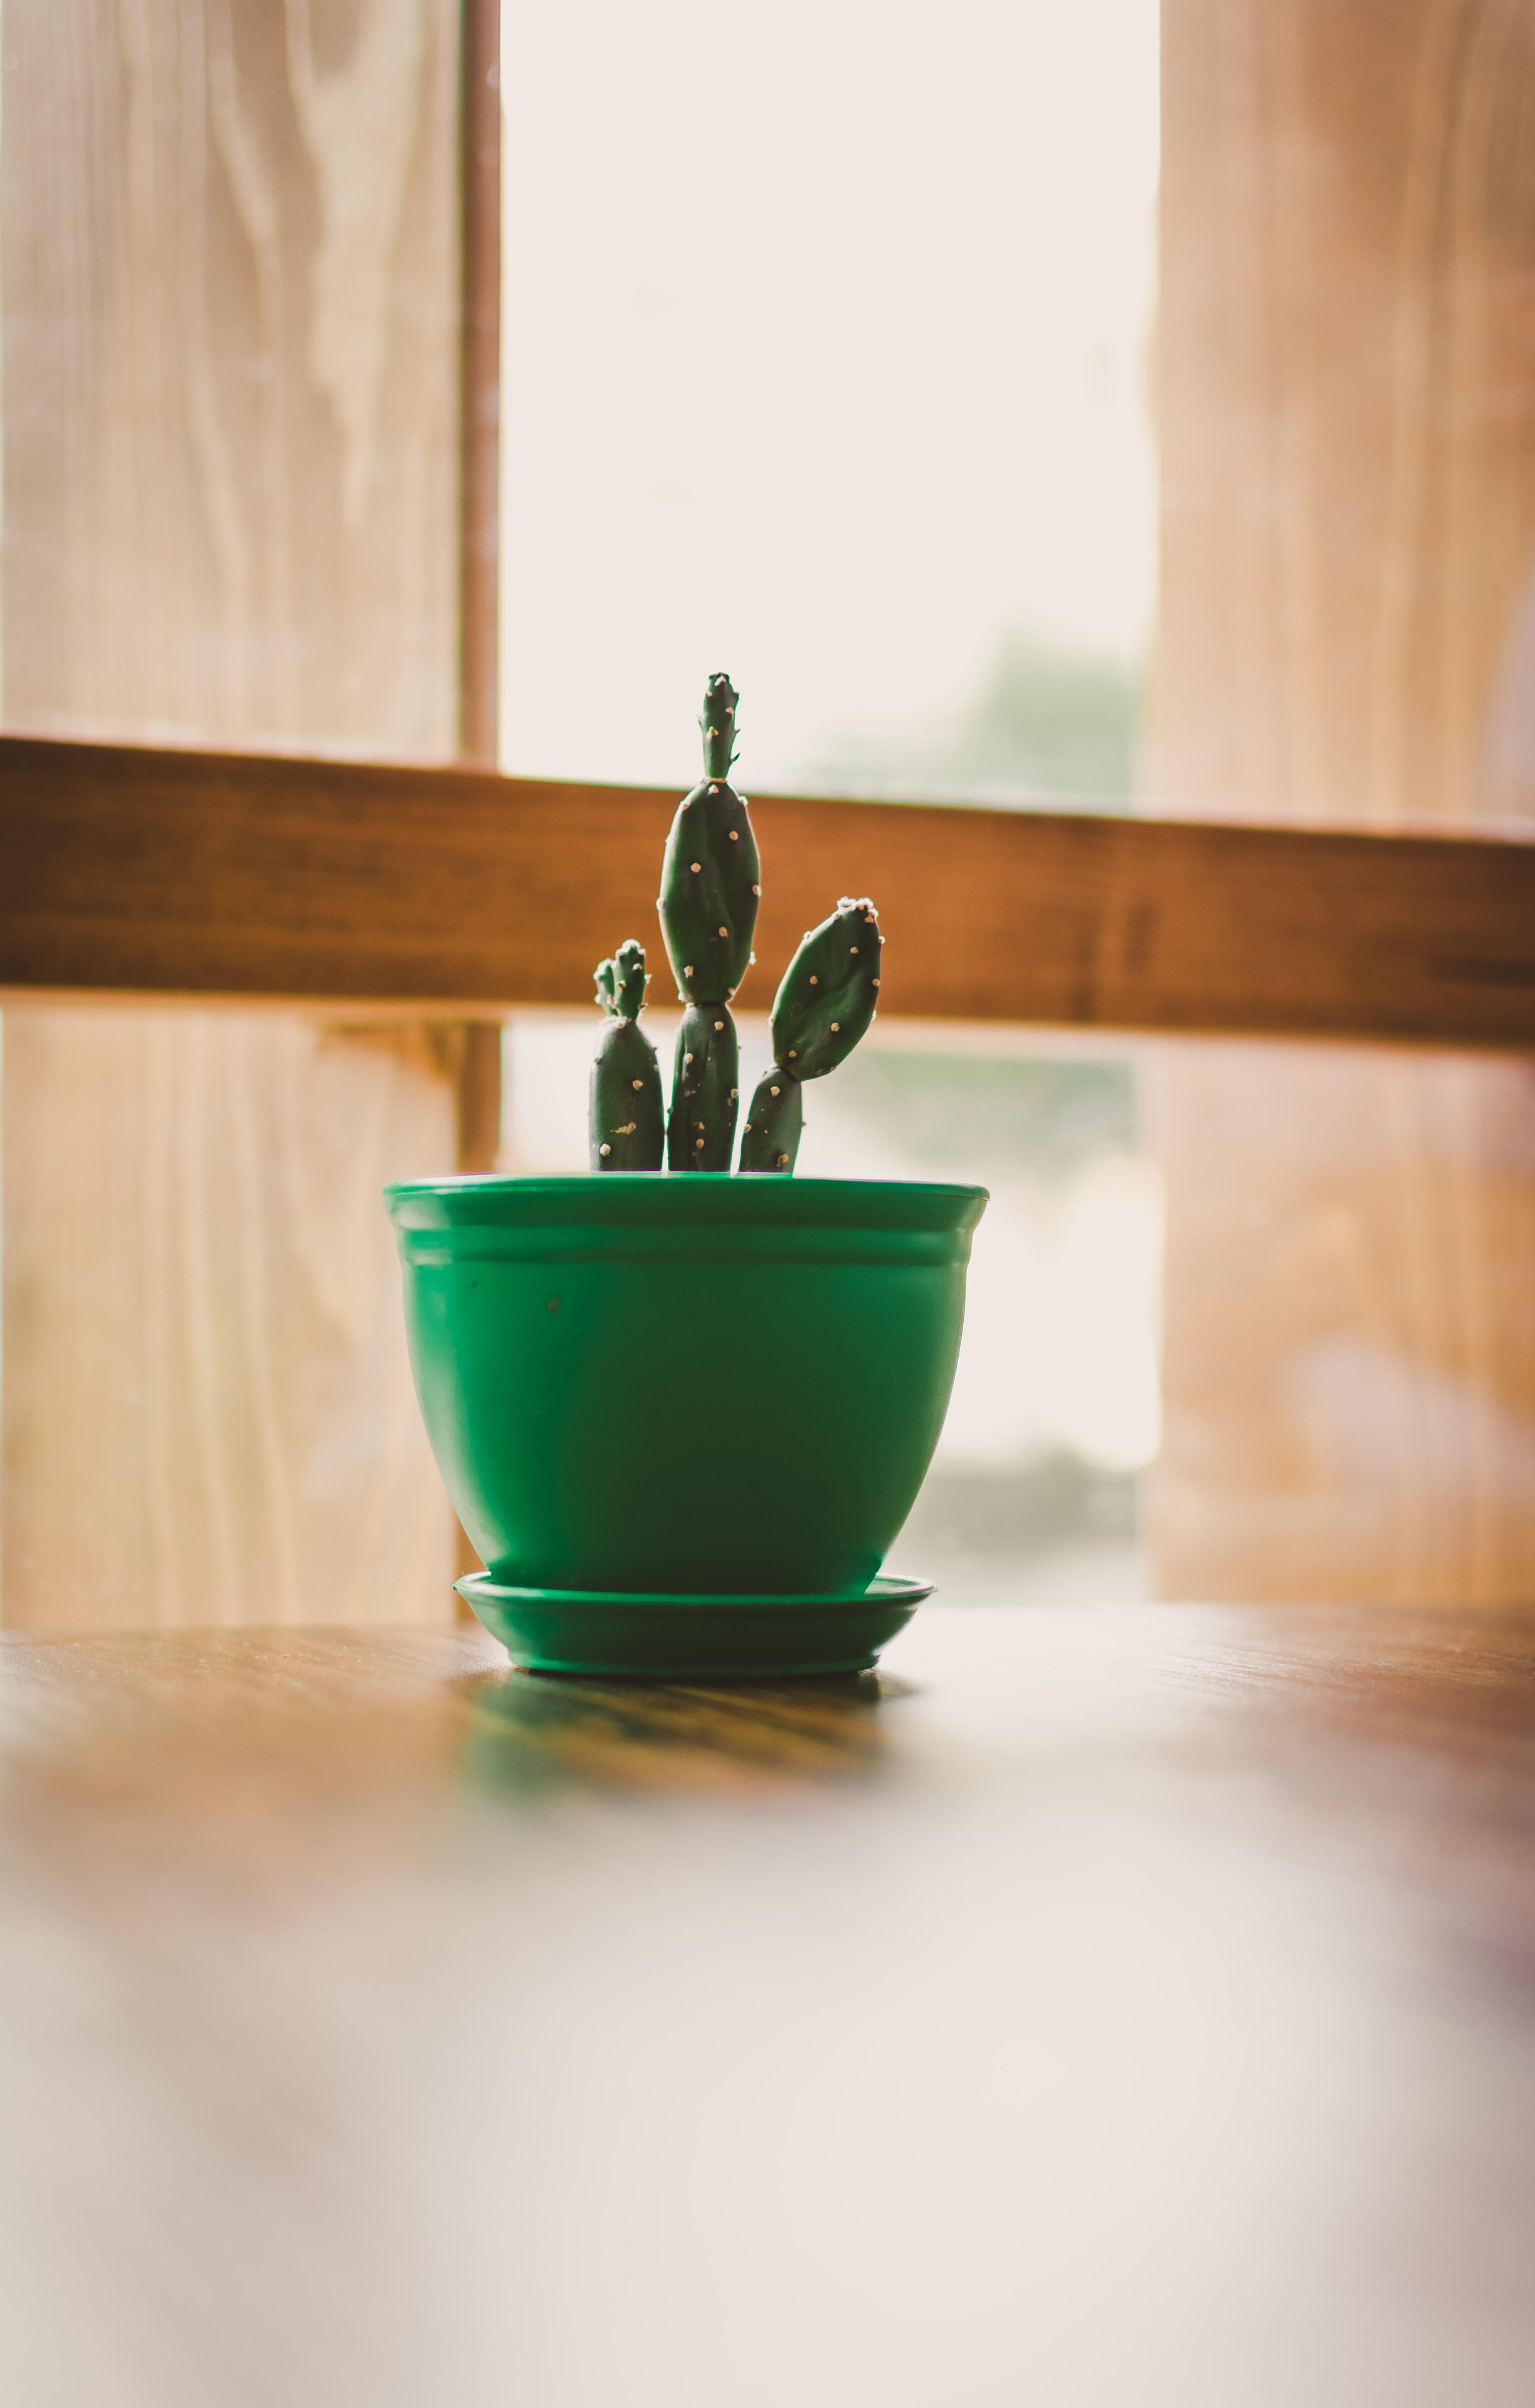 green cactus in green pot